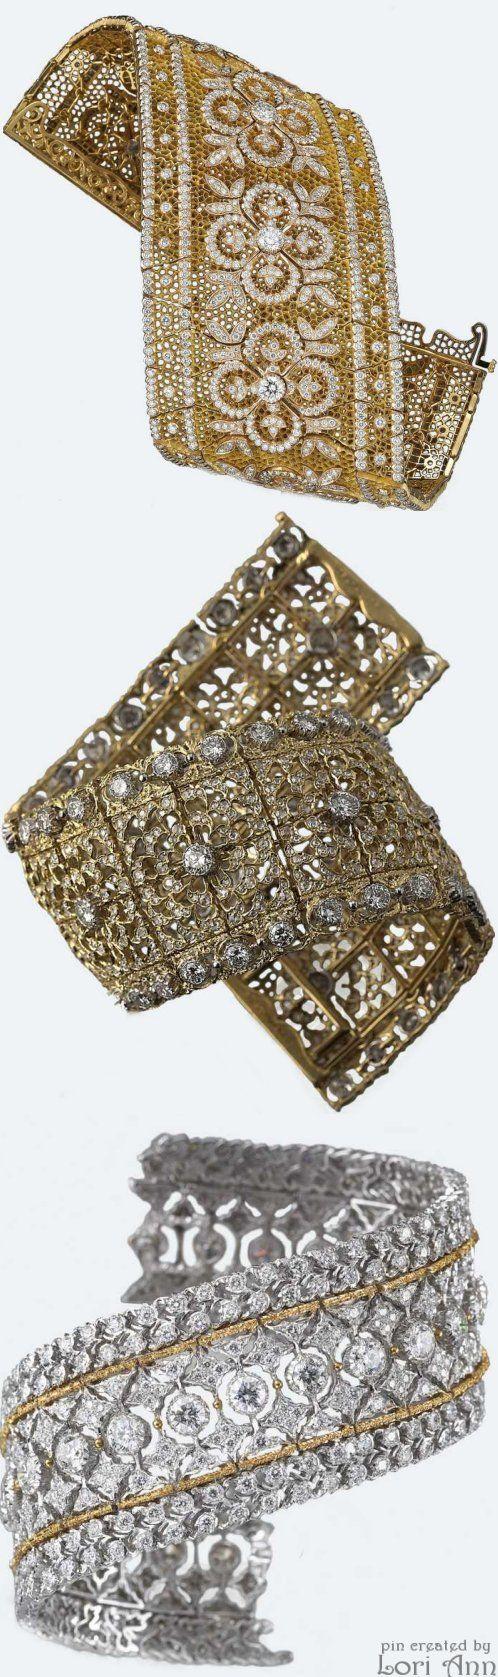 Buccellati High Jewelry Collection Bracelets